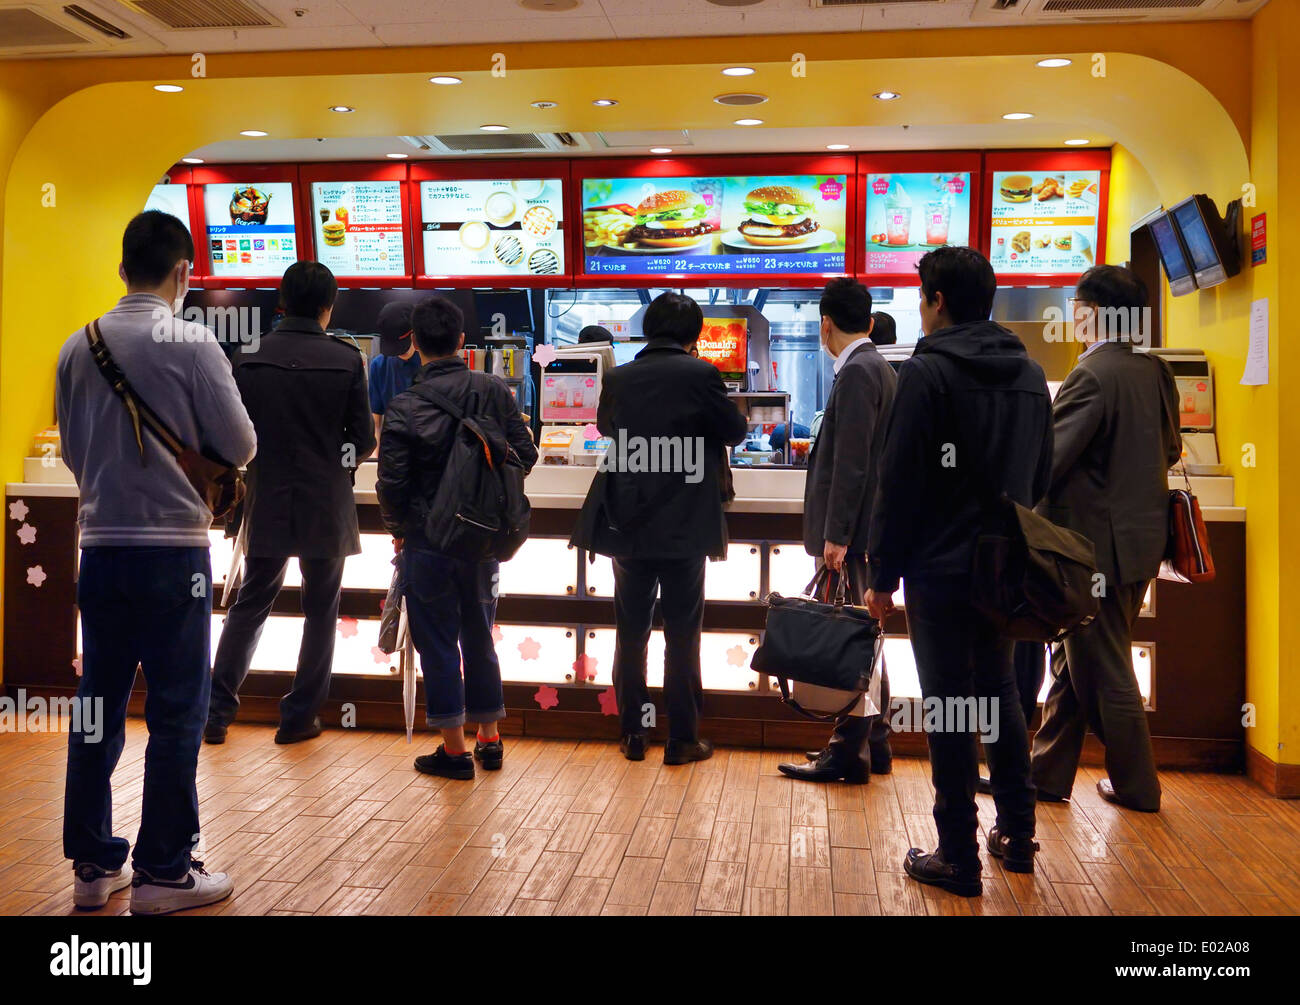 Chain of fast food restaurants Tokyo City: reviews, addresses, menu 3